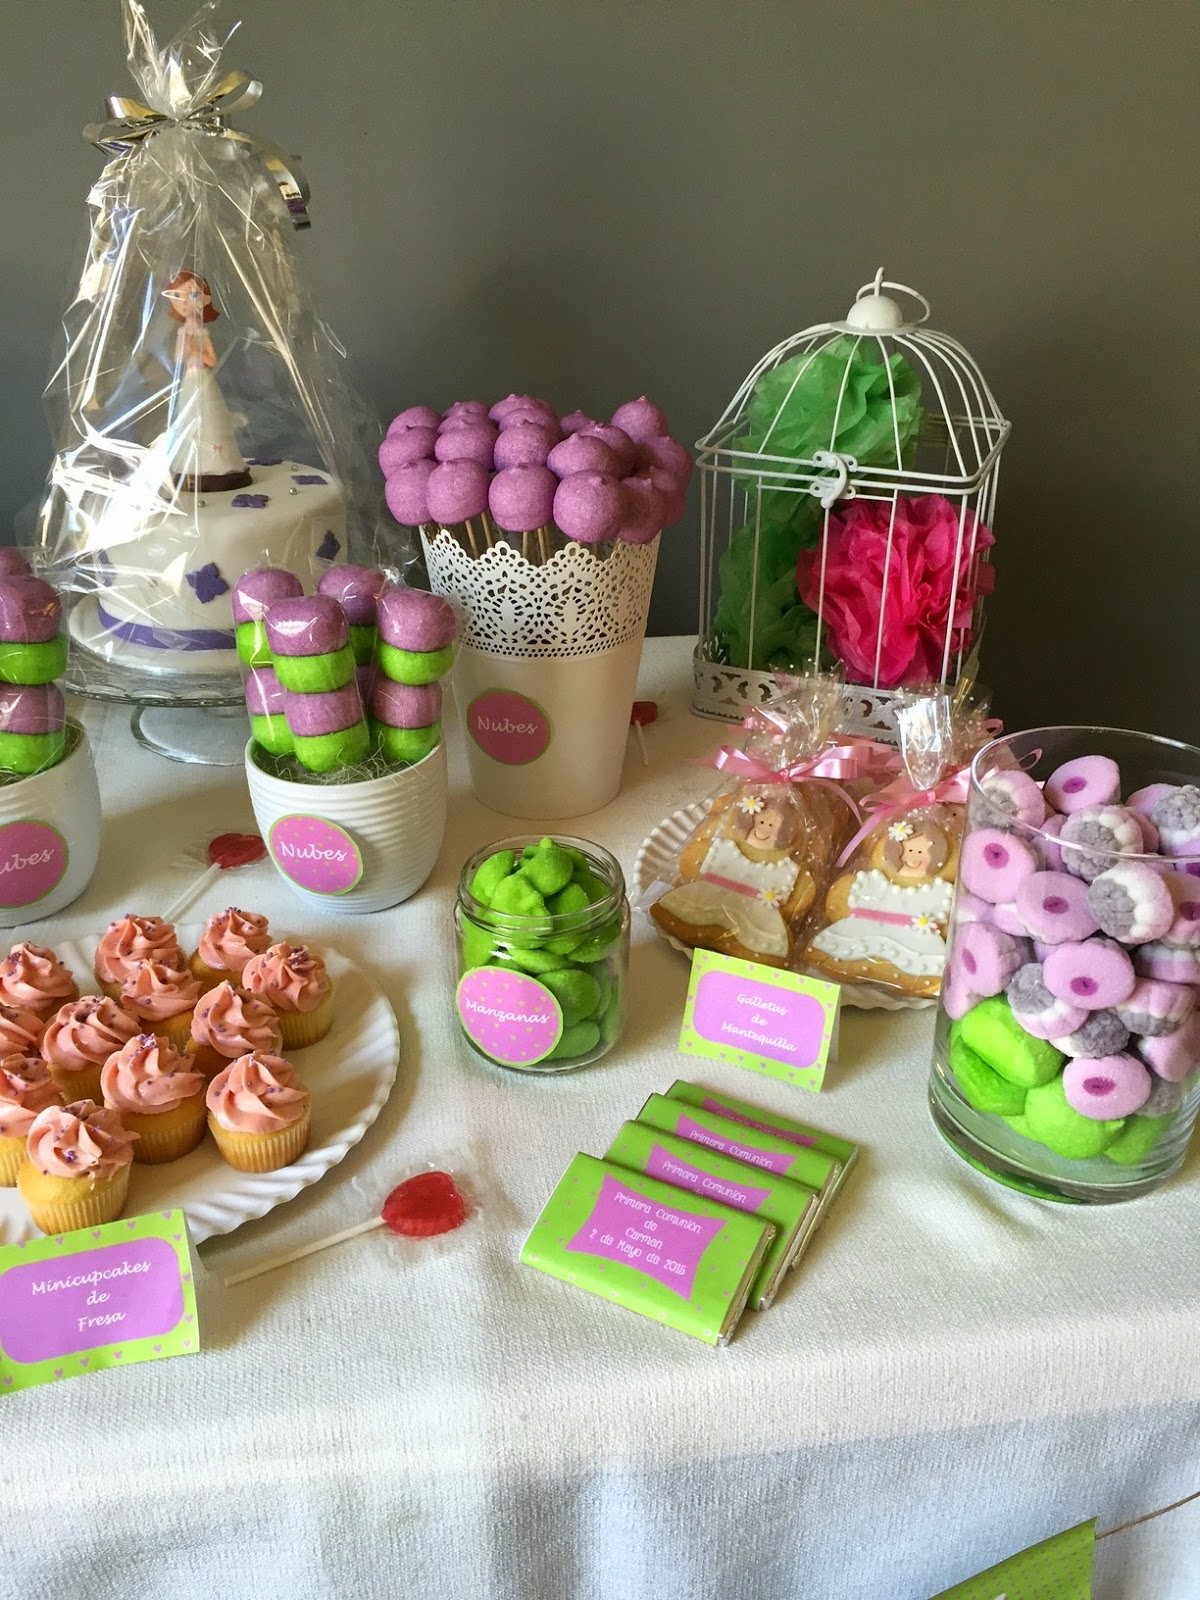 Sabores muy dulces mesa dulce para comuni n verde y morado for Mesas dulces comunion nina